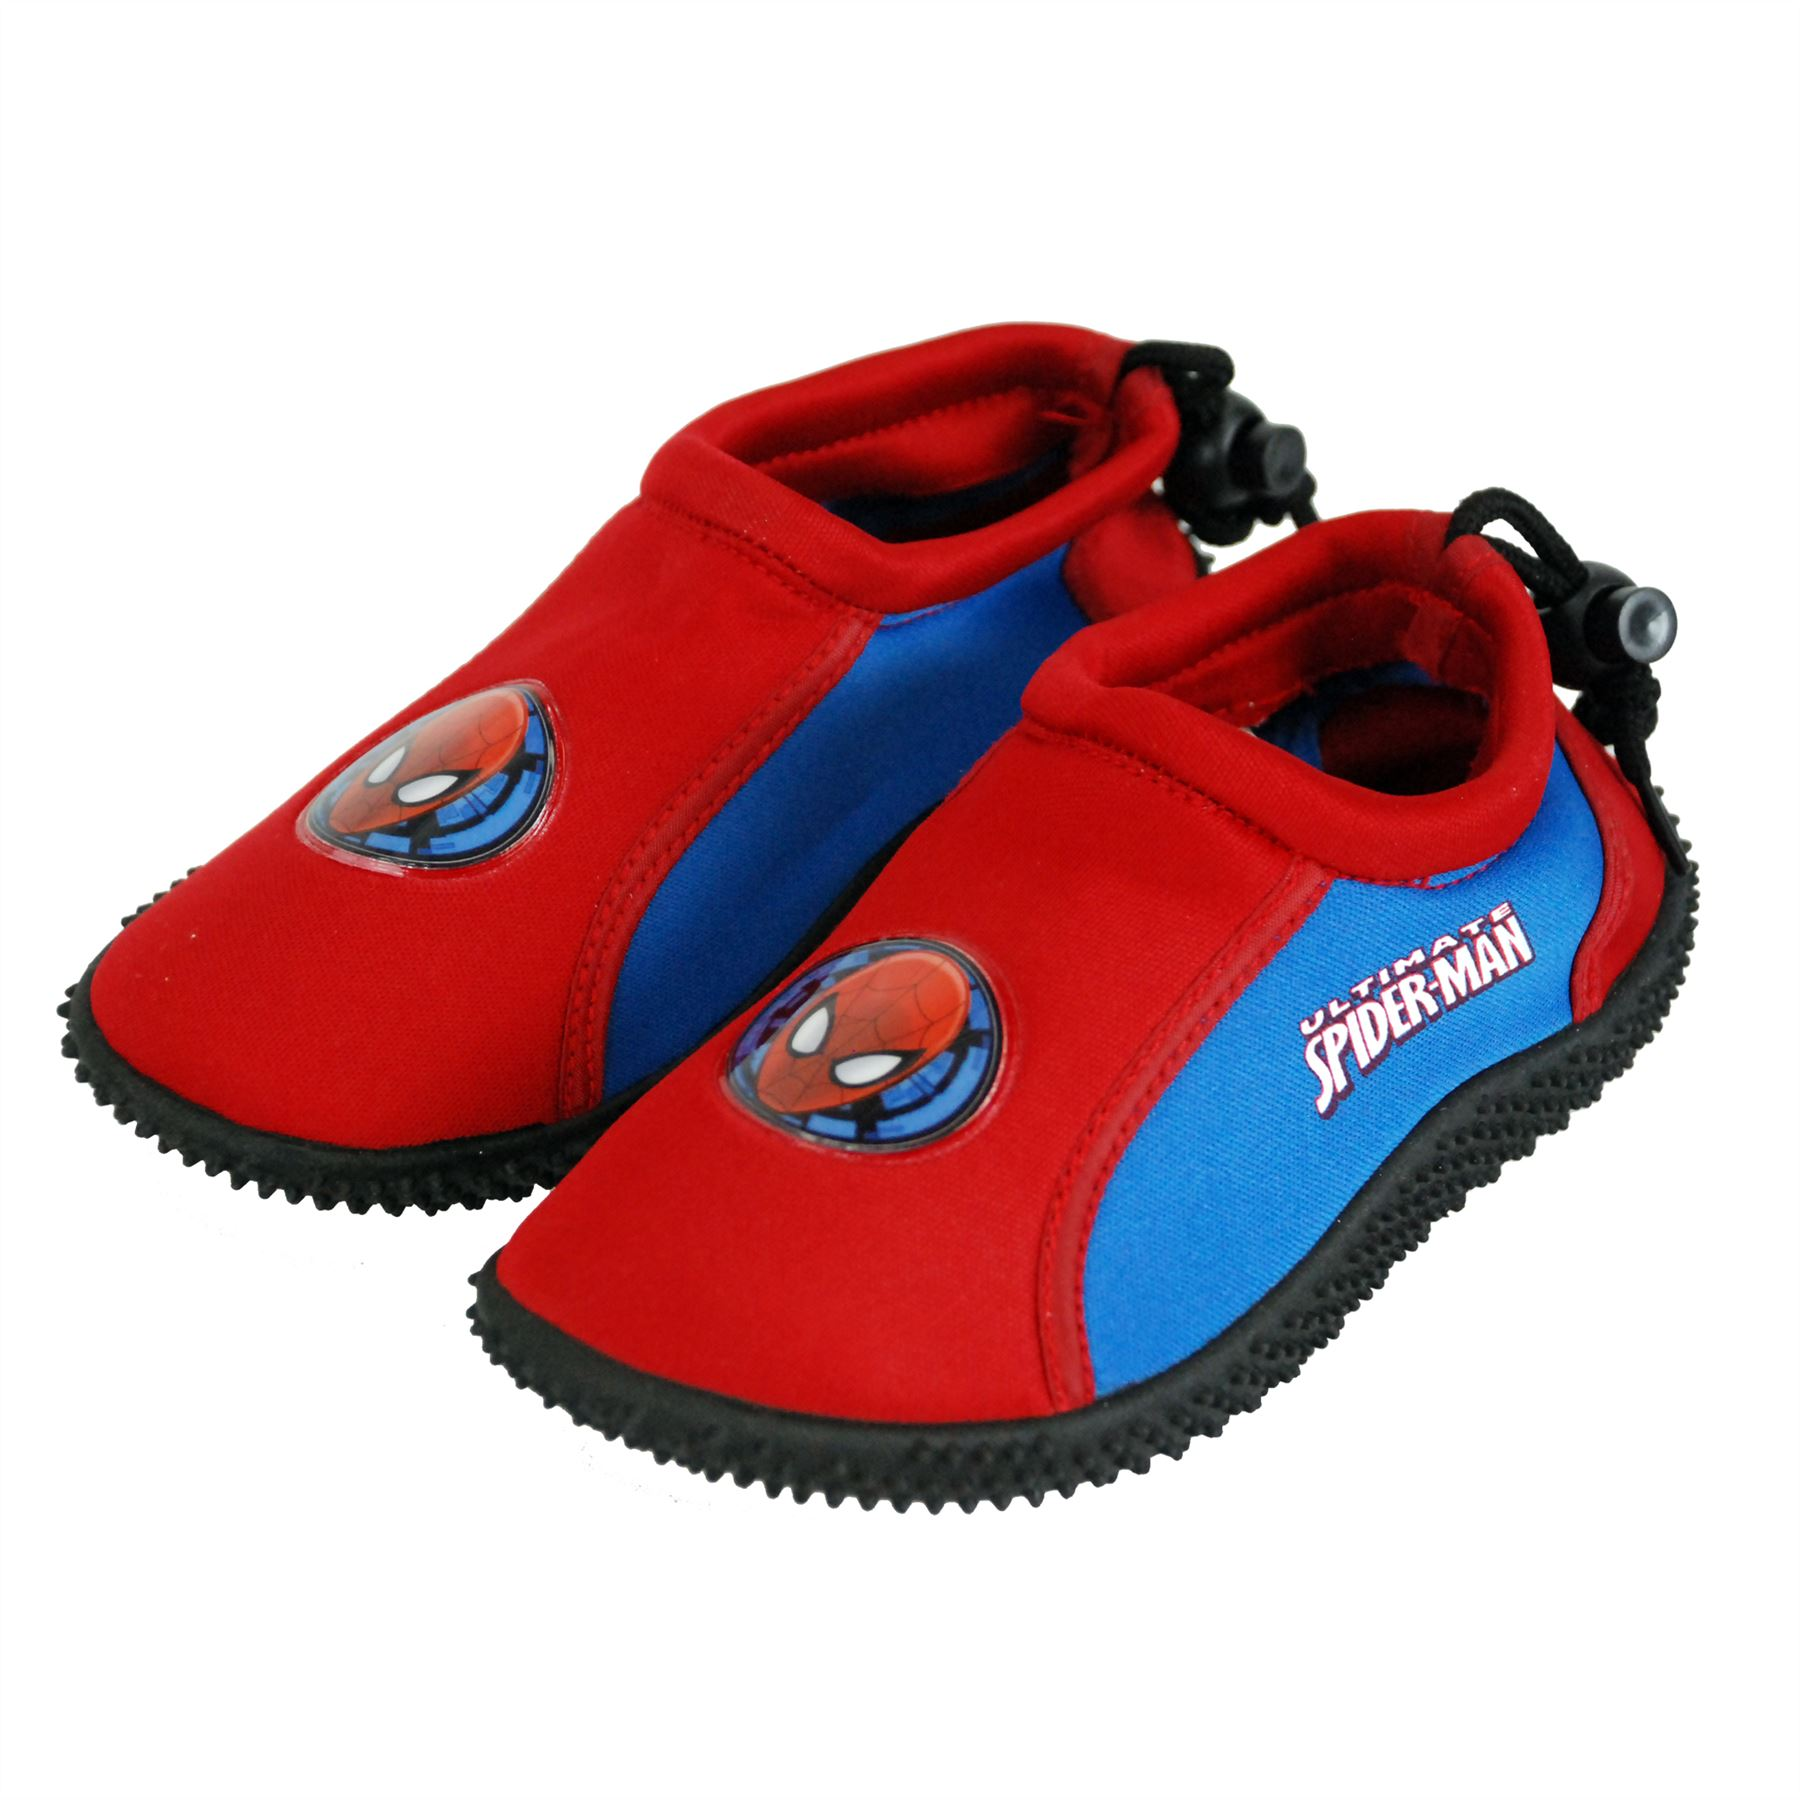 Spiderman Water Shoes Aqua Wet Boys